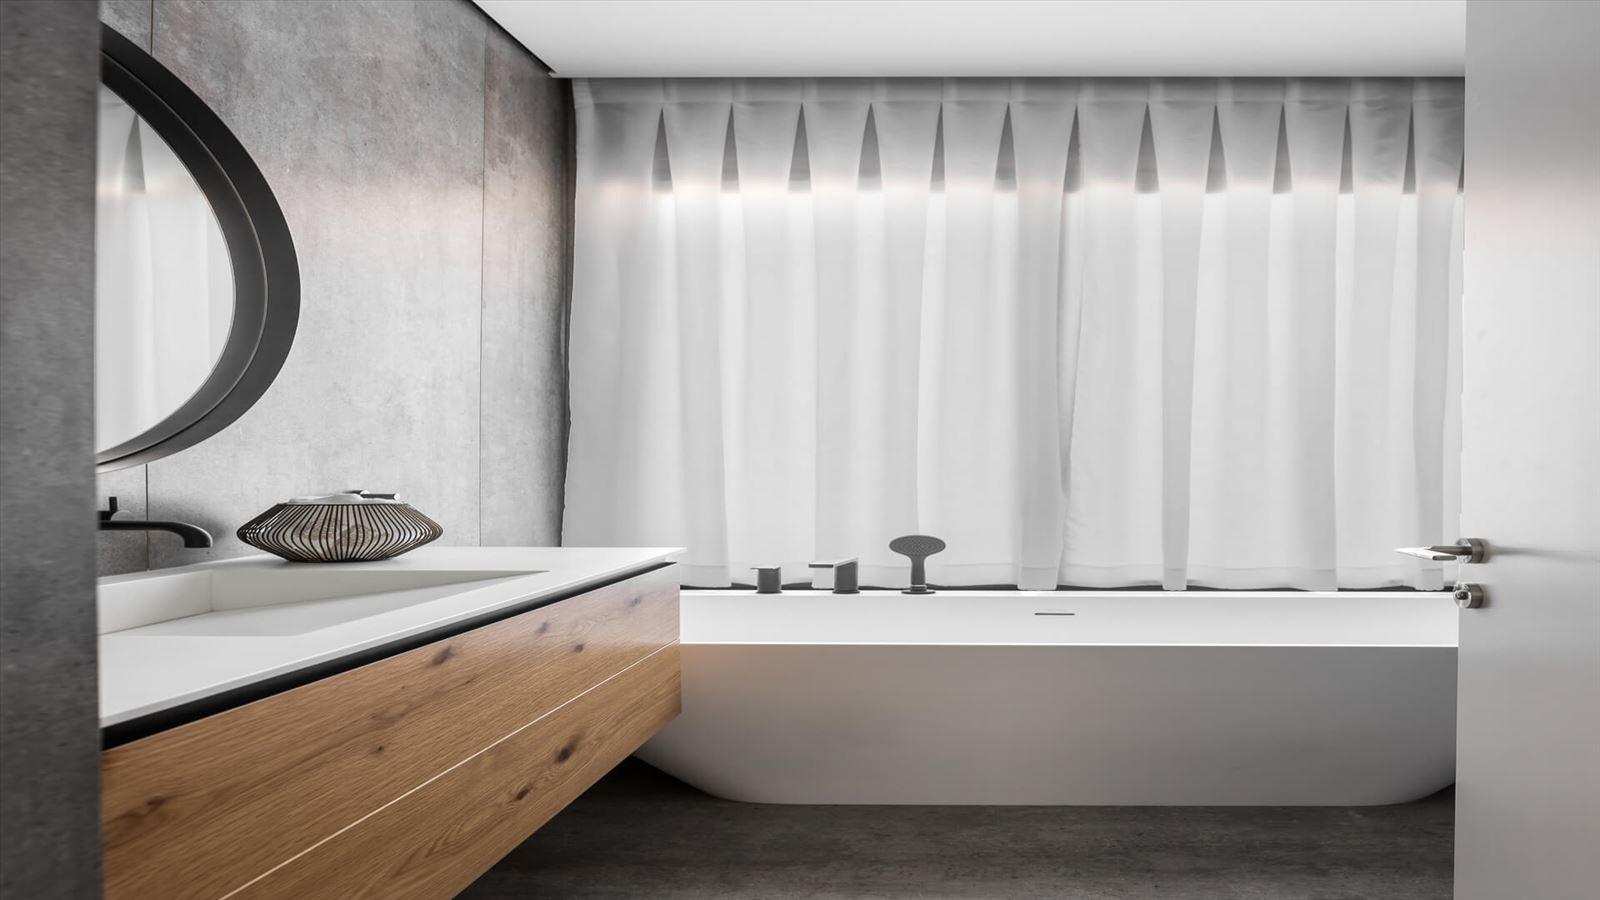 Penthouse Carmelit -  תאורה מעוצבת במקלחת על ידי דורי קמחי